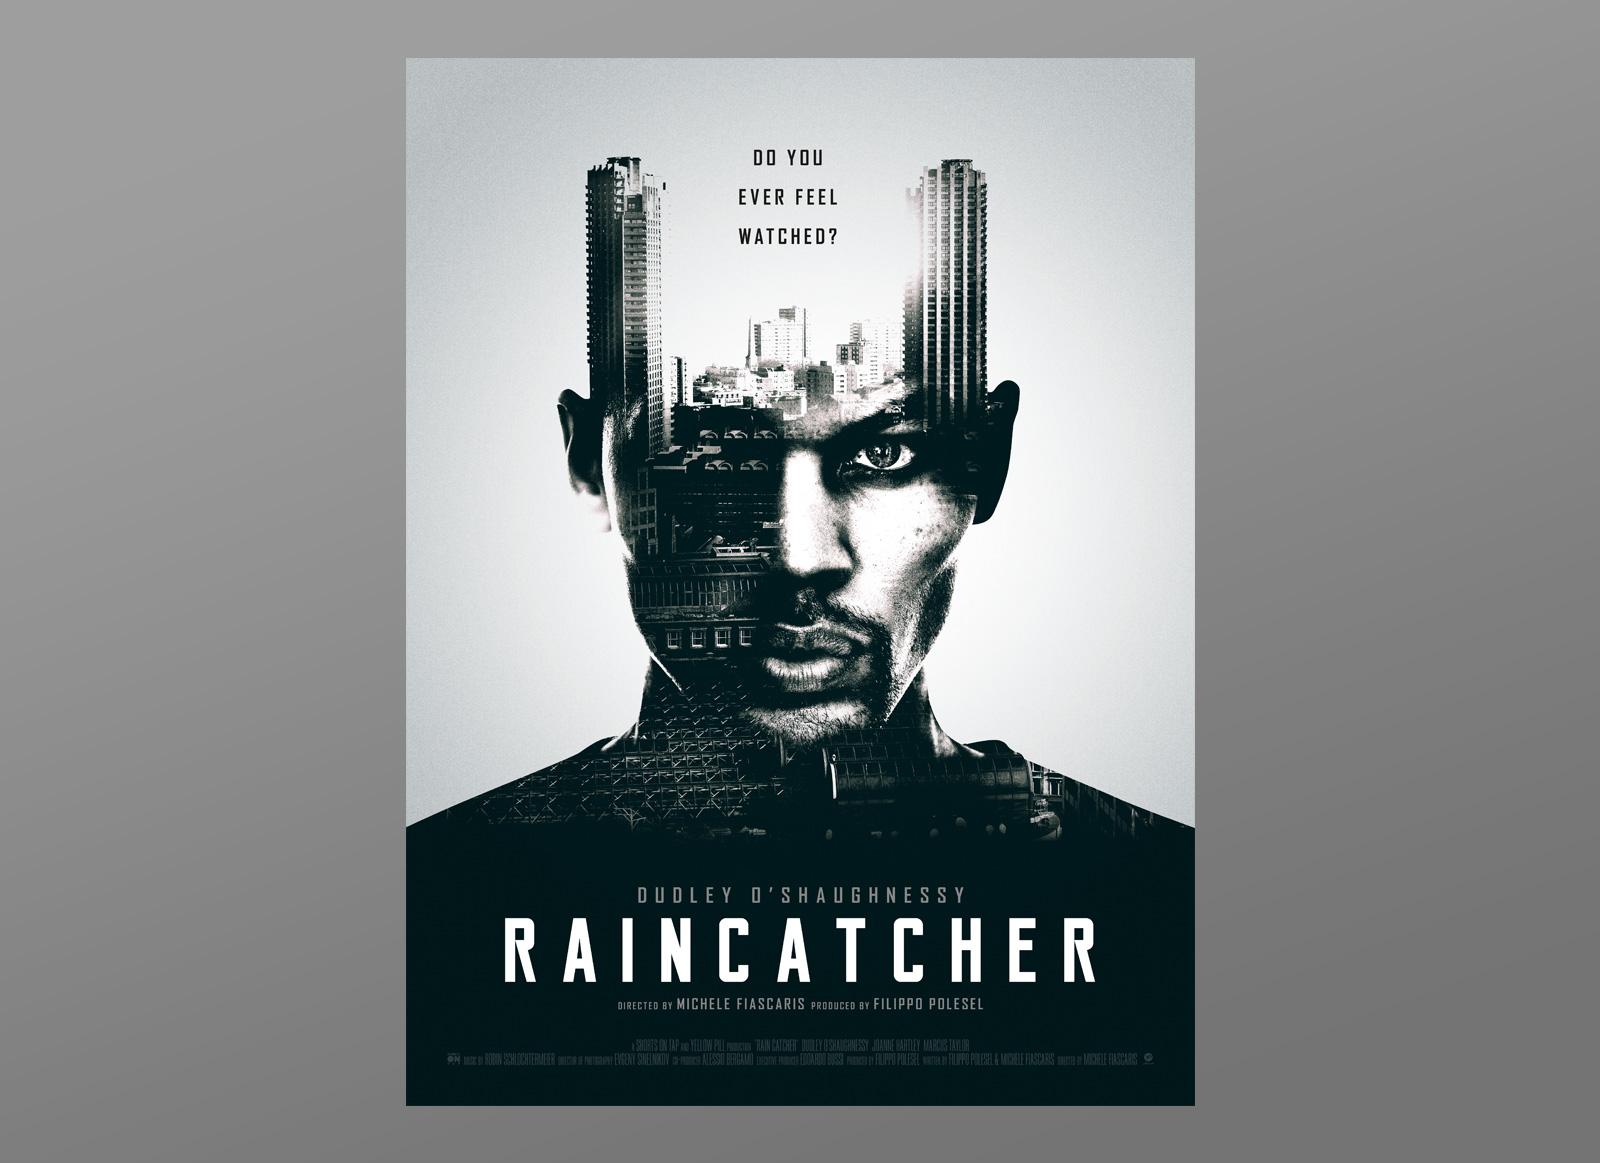 Website_Raincatcher_1Sheet1.jpg